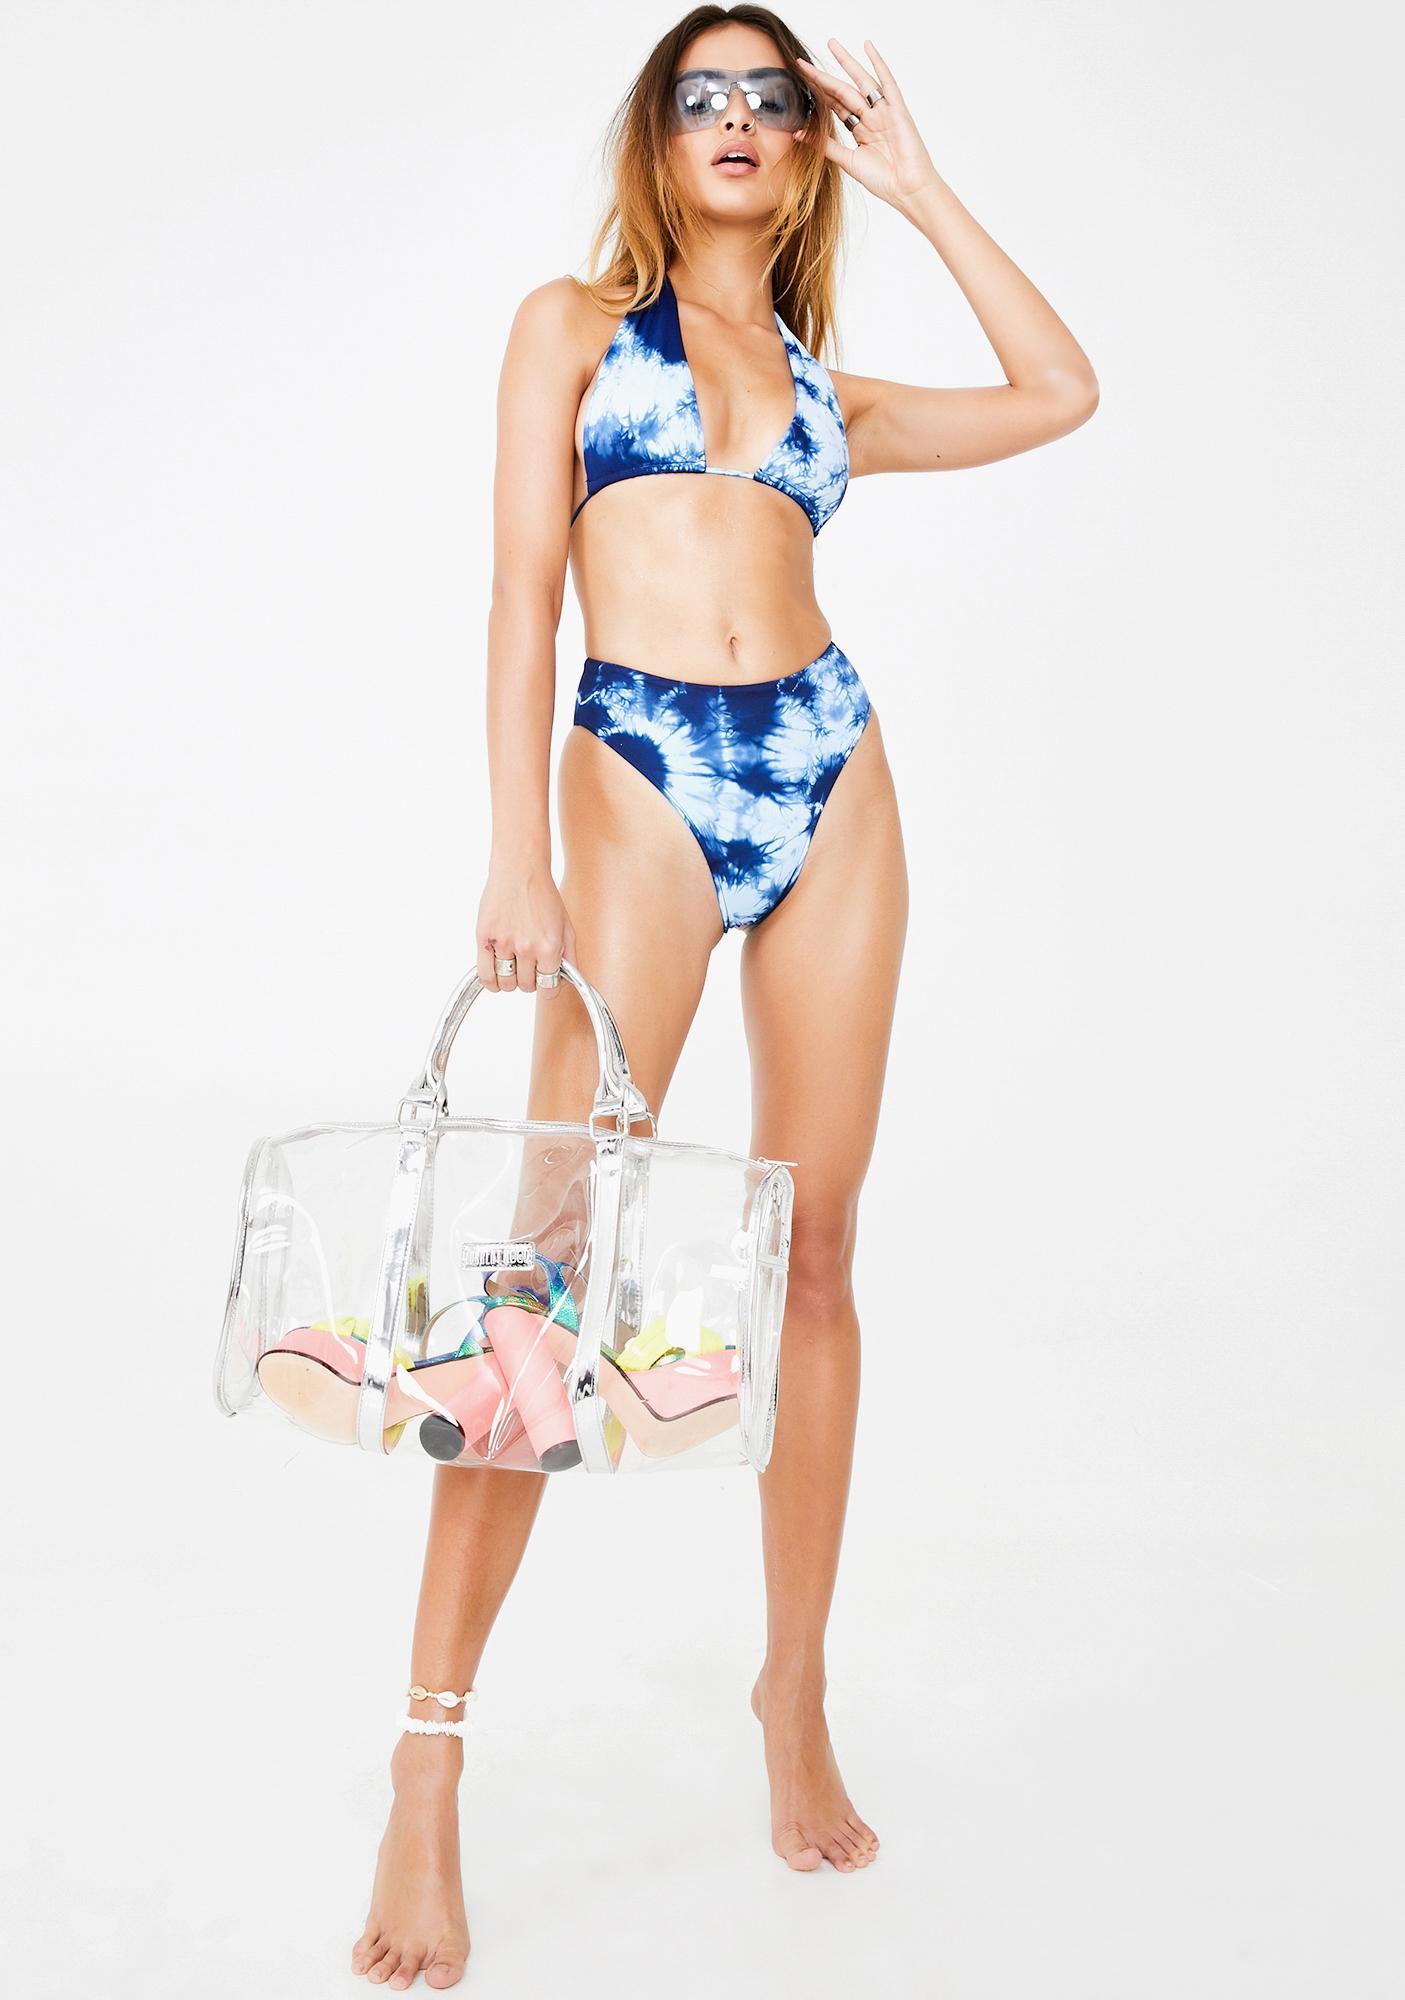 Frankies Bikinis X Sofia Richie Jordan Bikini Top